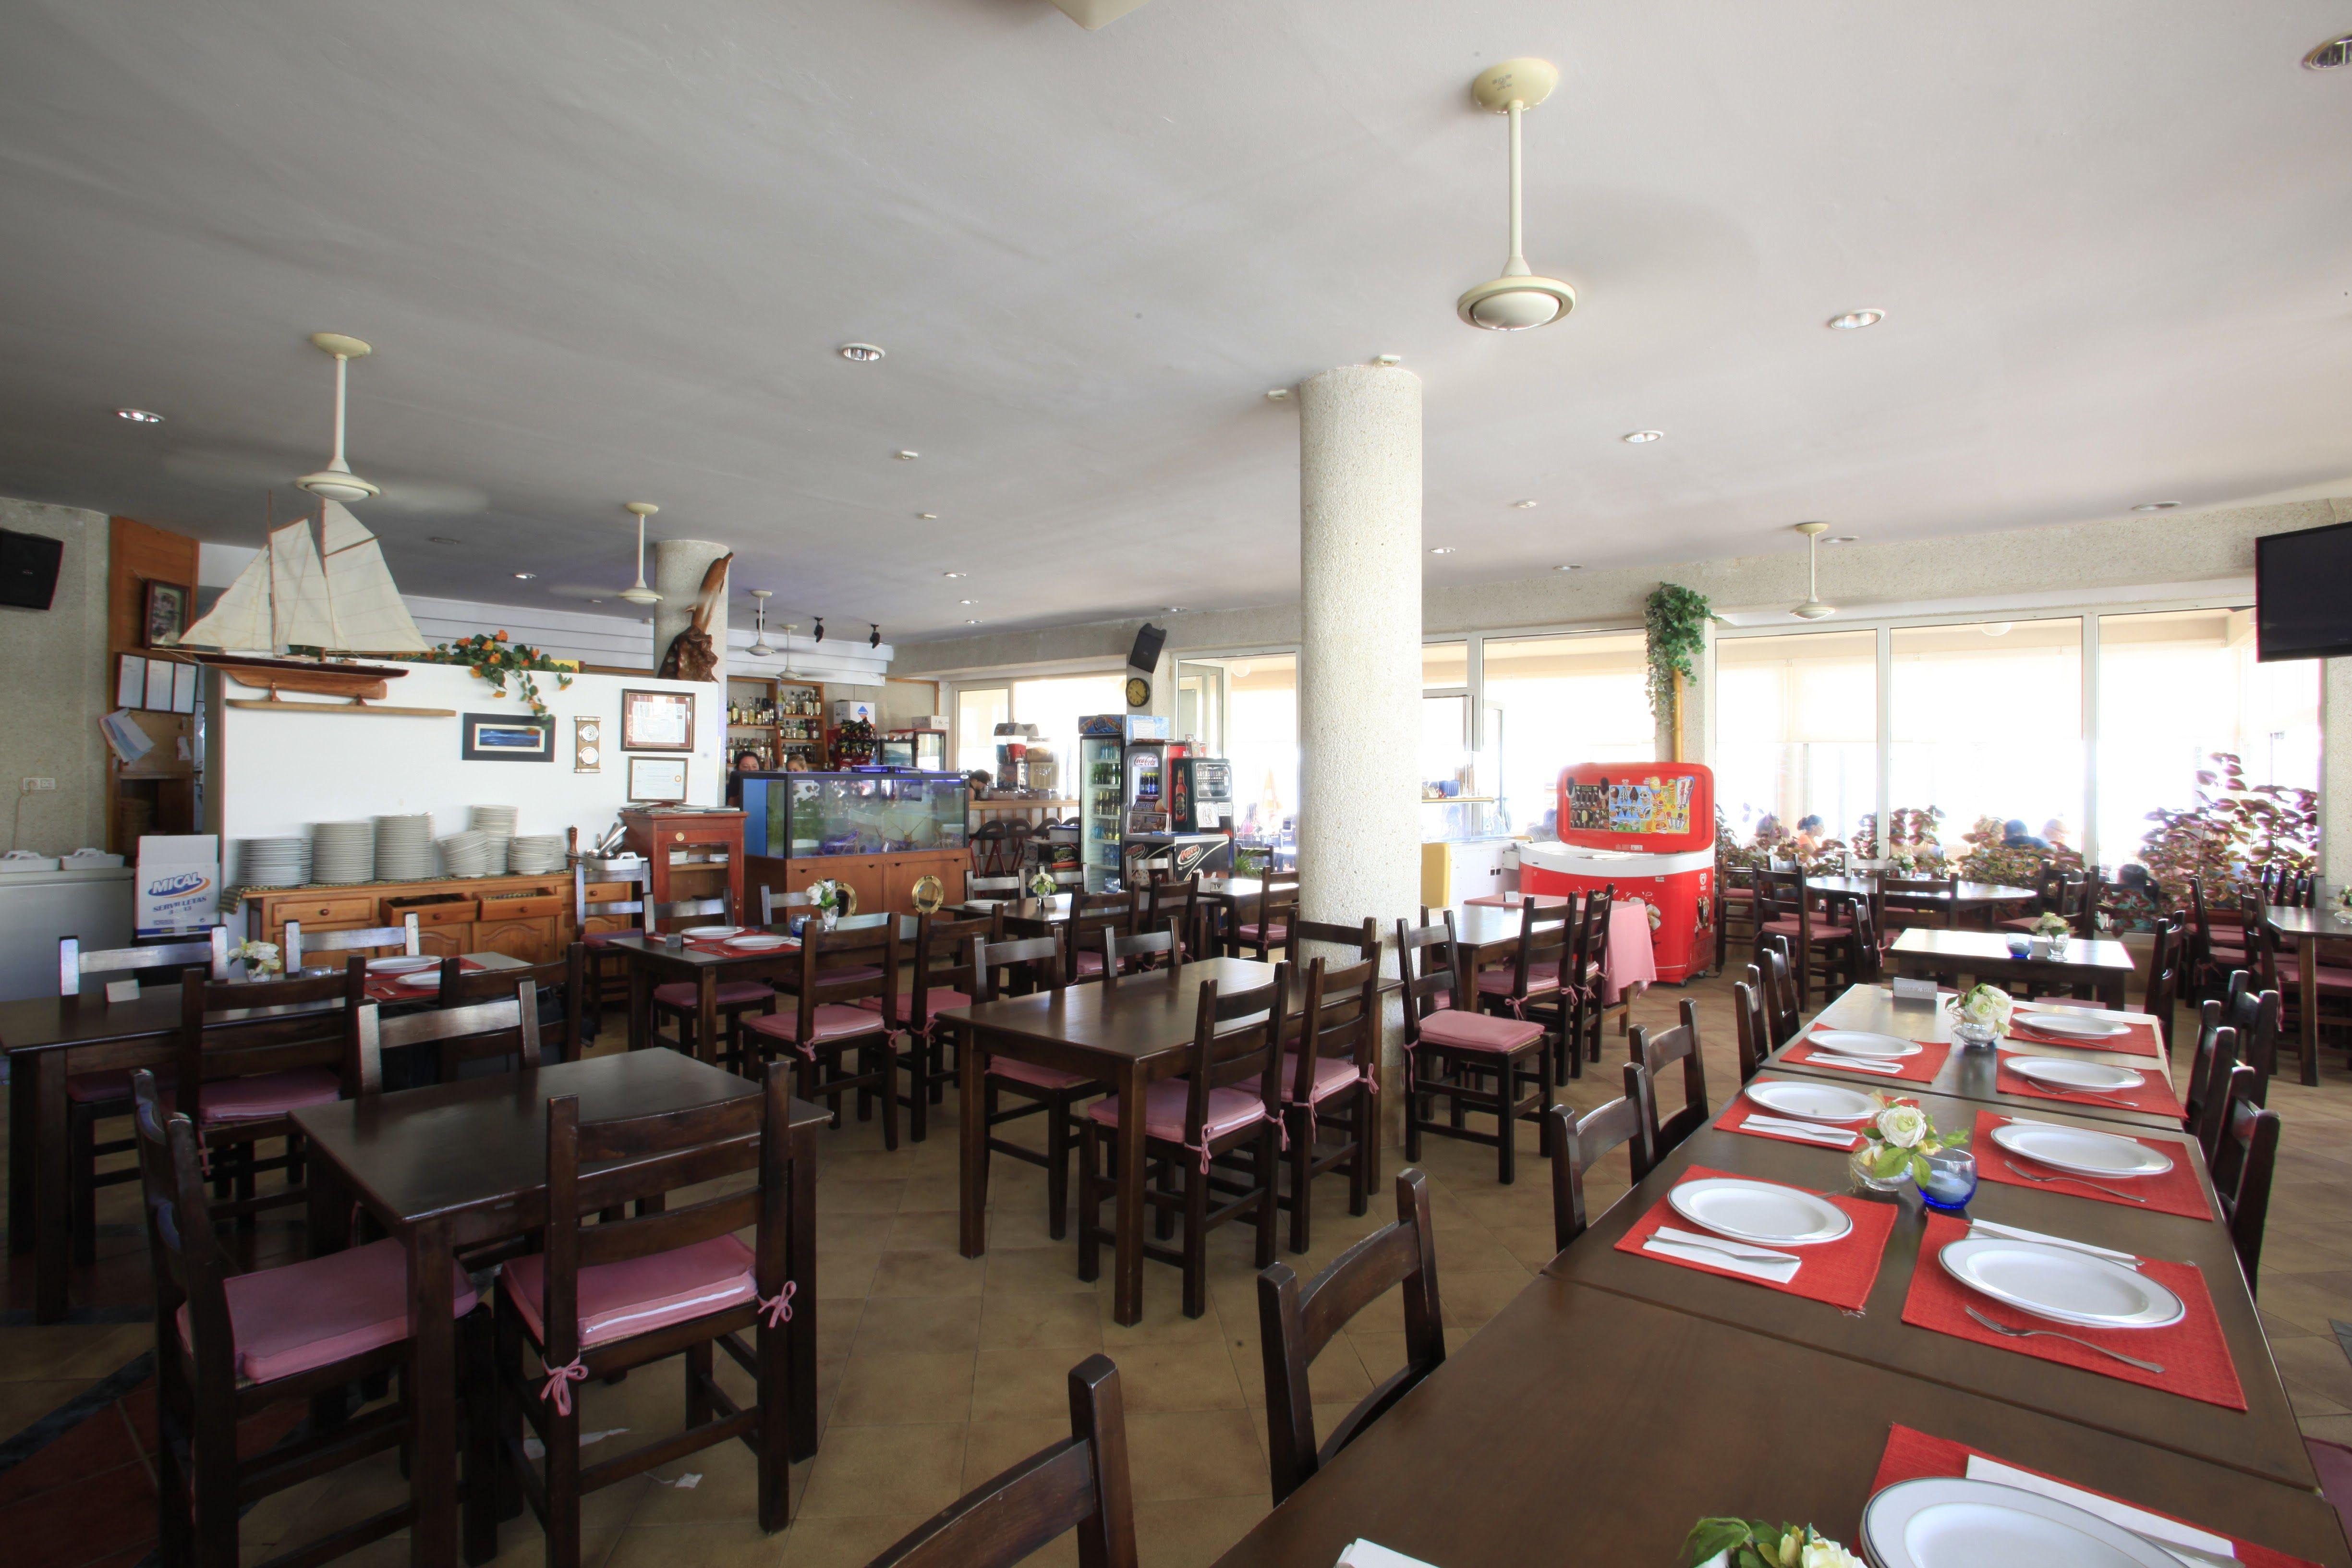 Foto 6 de Restaurante en Sant Antoni de Portmany | Restaurante Sa Punta D'es Moli